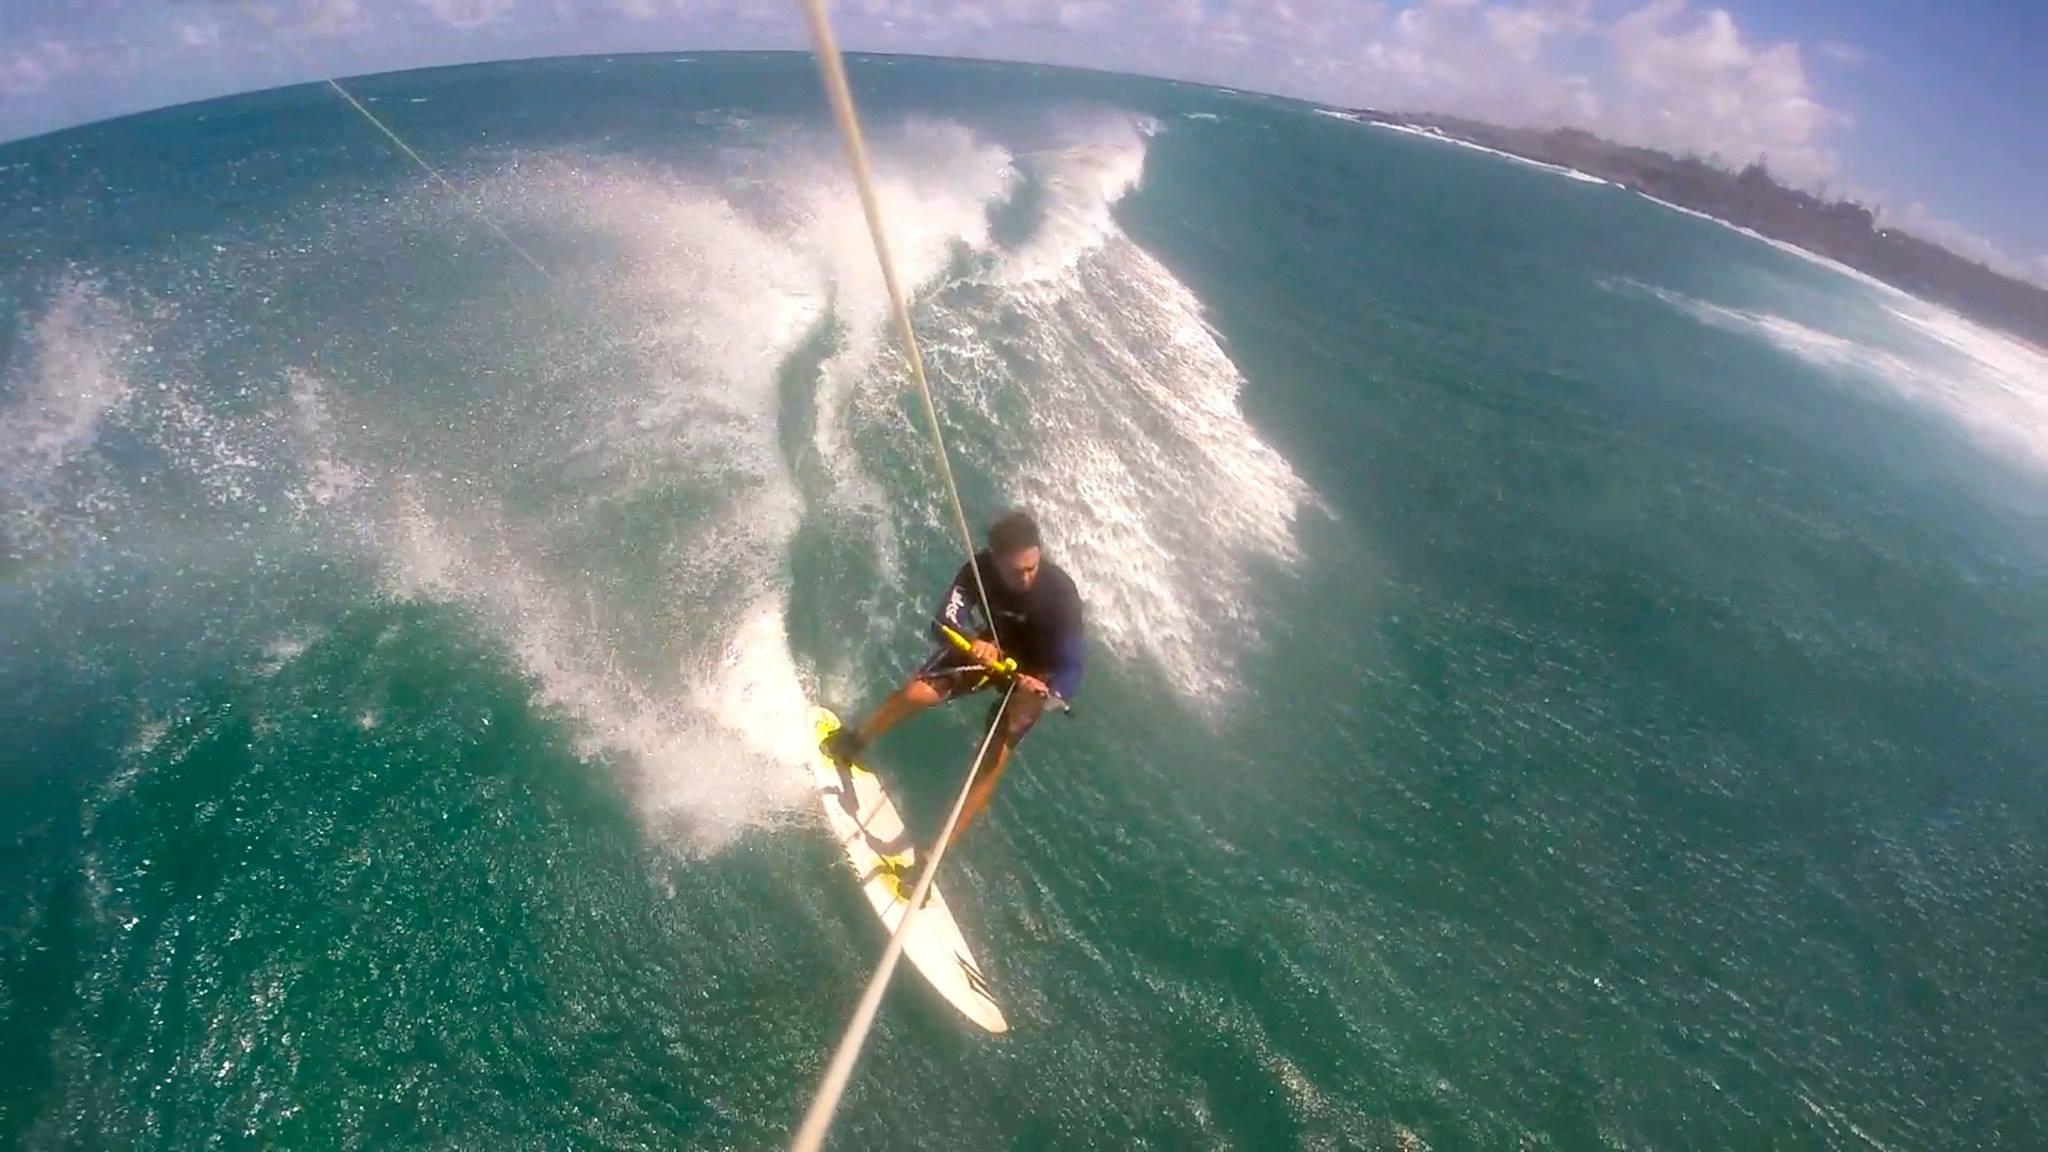 Paul Franco kitesurfing Lanes